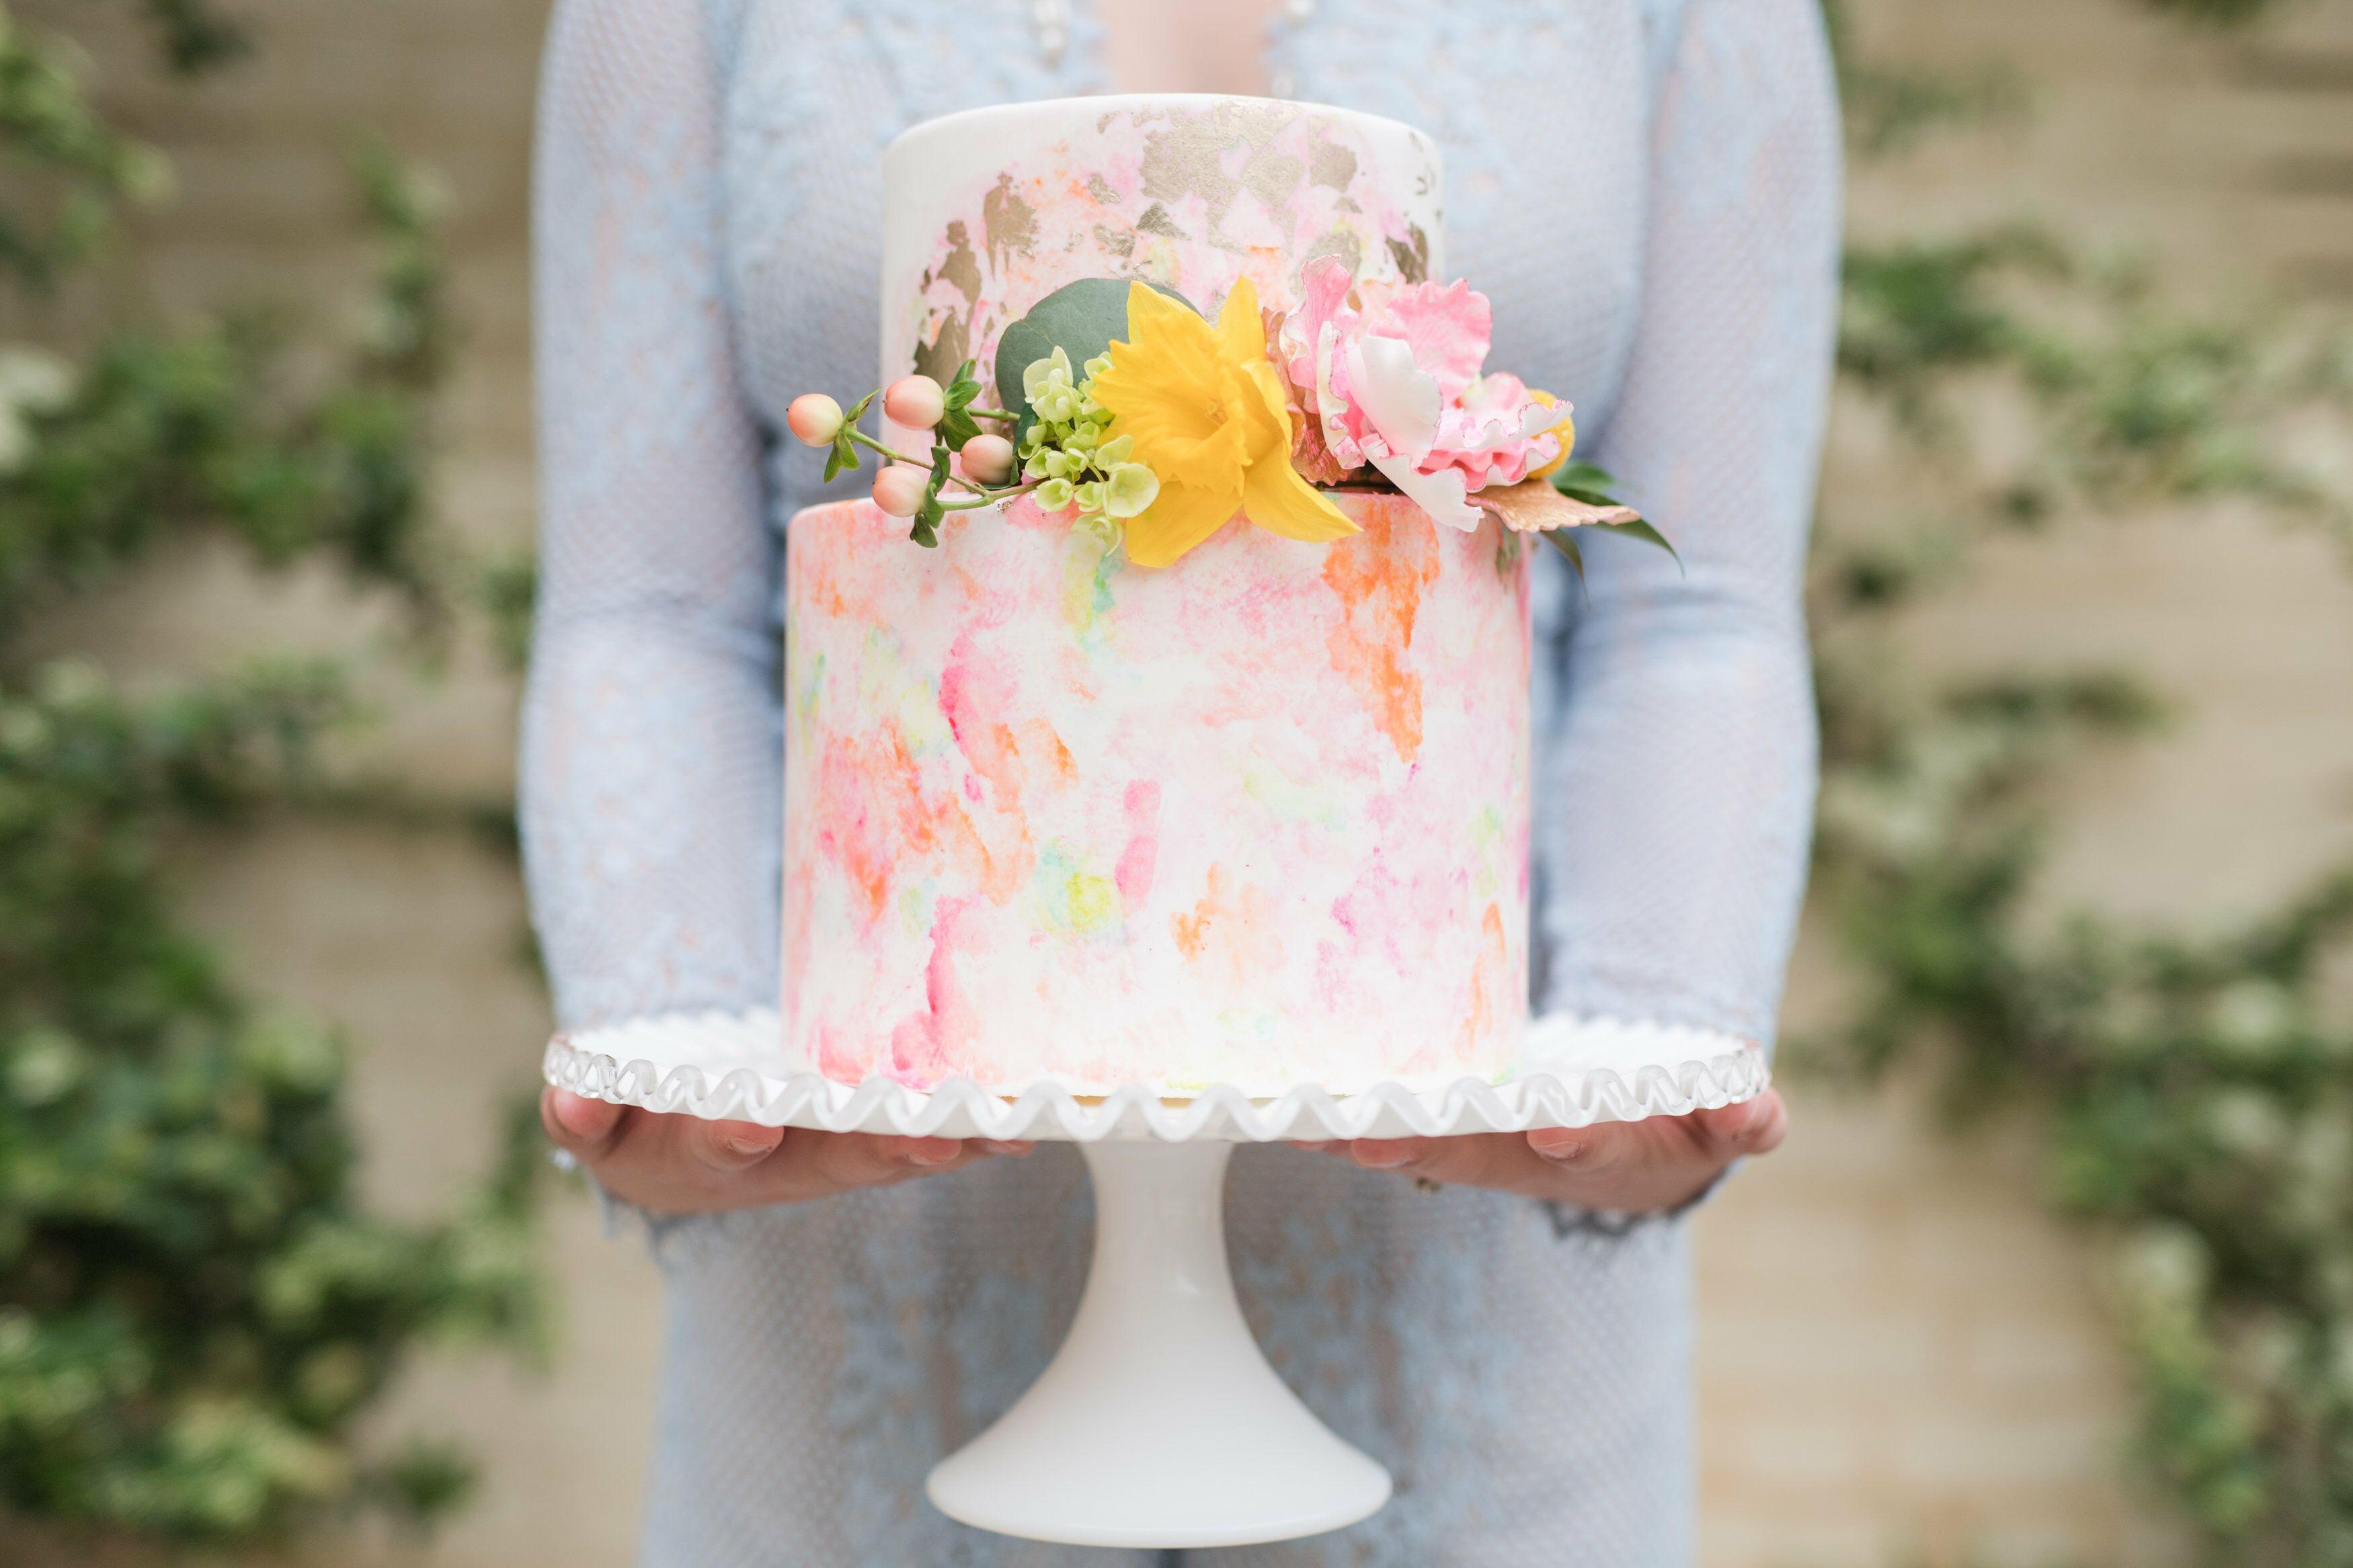 Amazing Celestial Cakery Wedding Cakes Charlotte Nc Funny Birthday Cards Online Alyptdamsfinfo